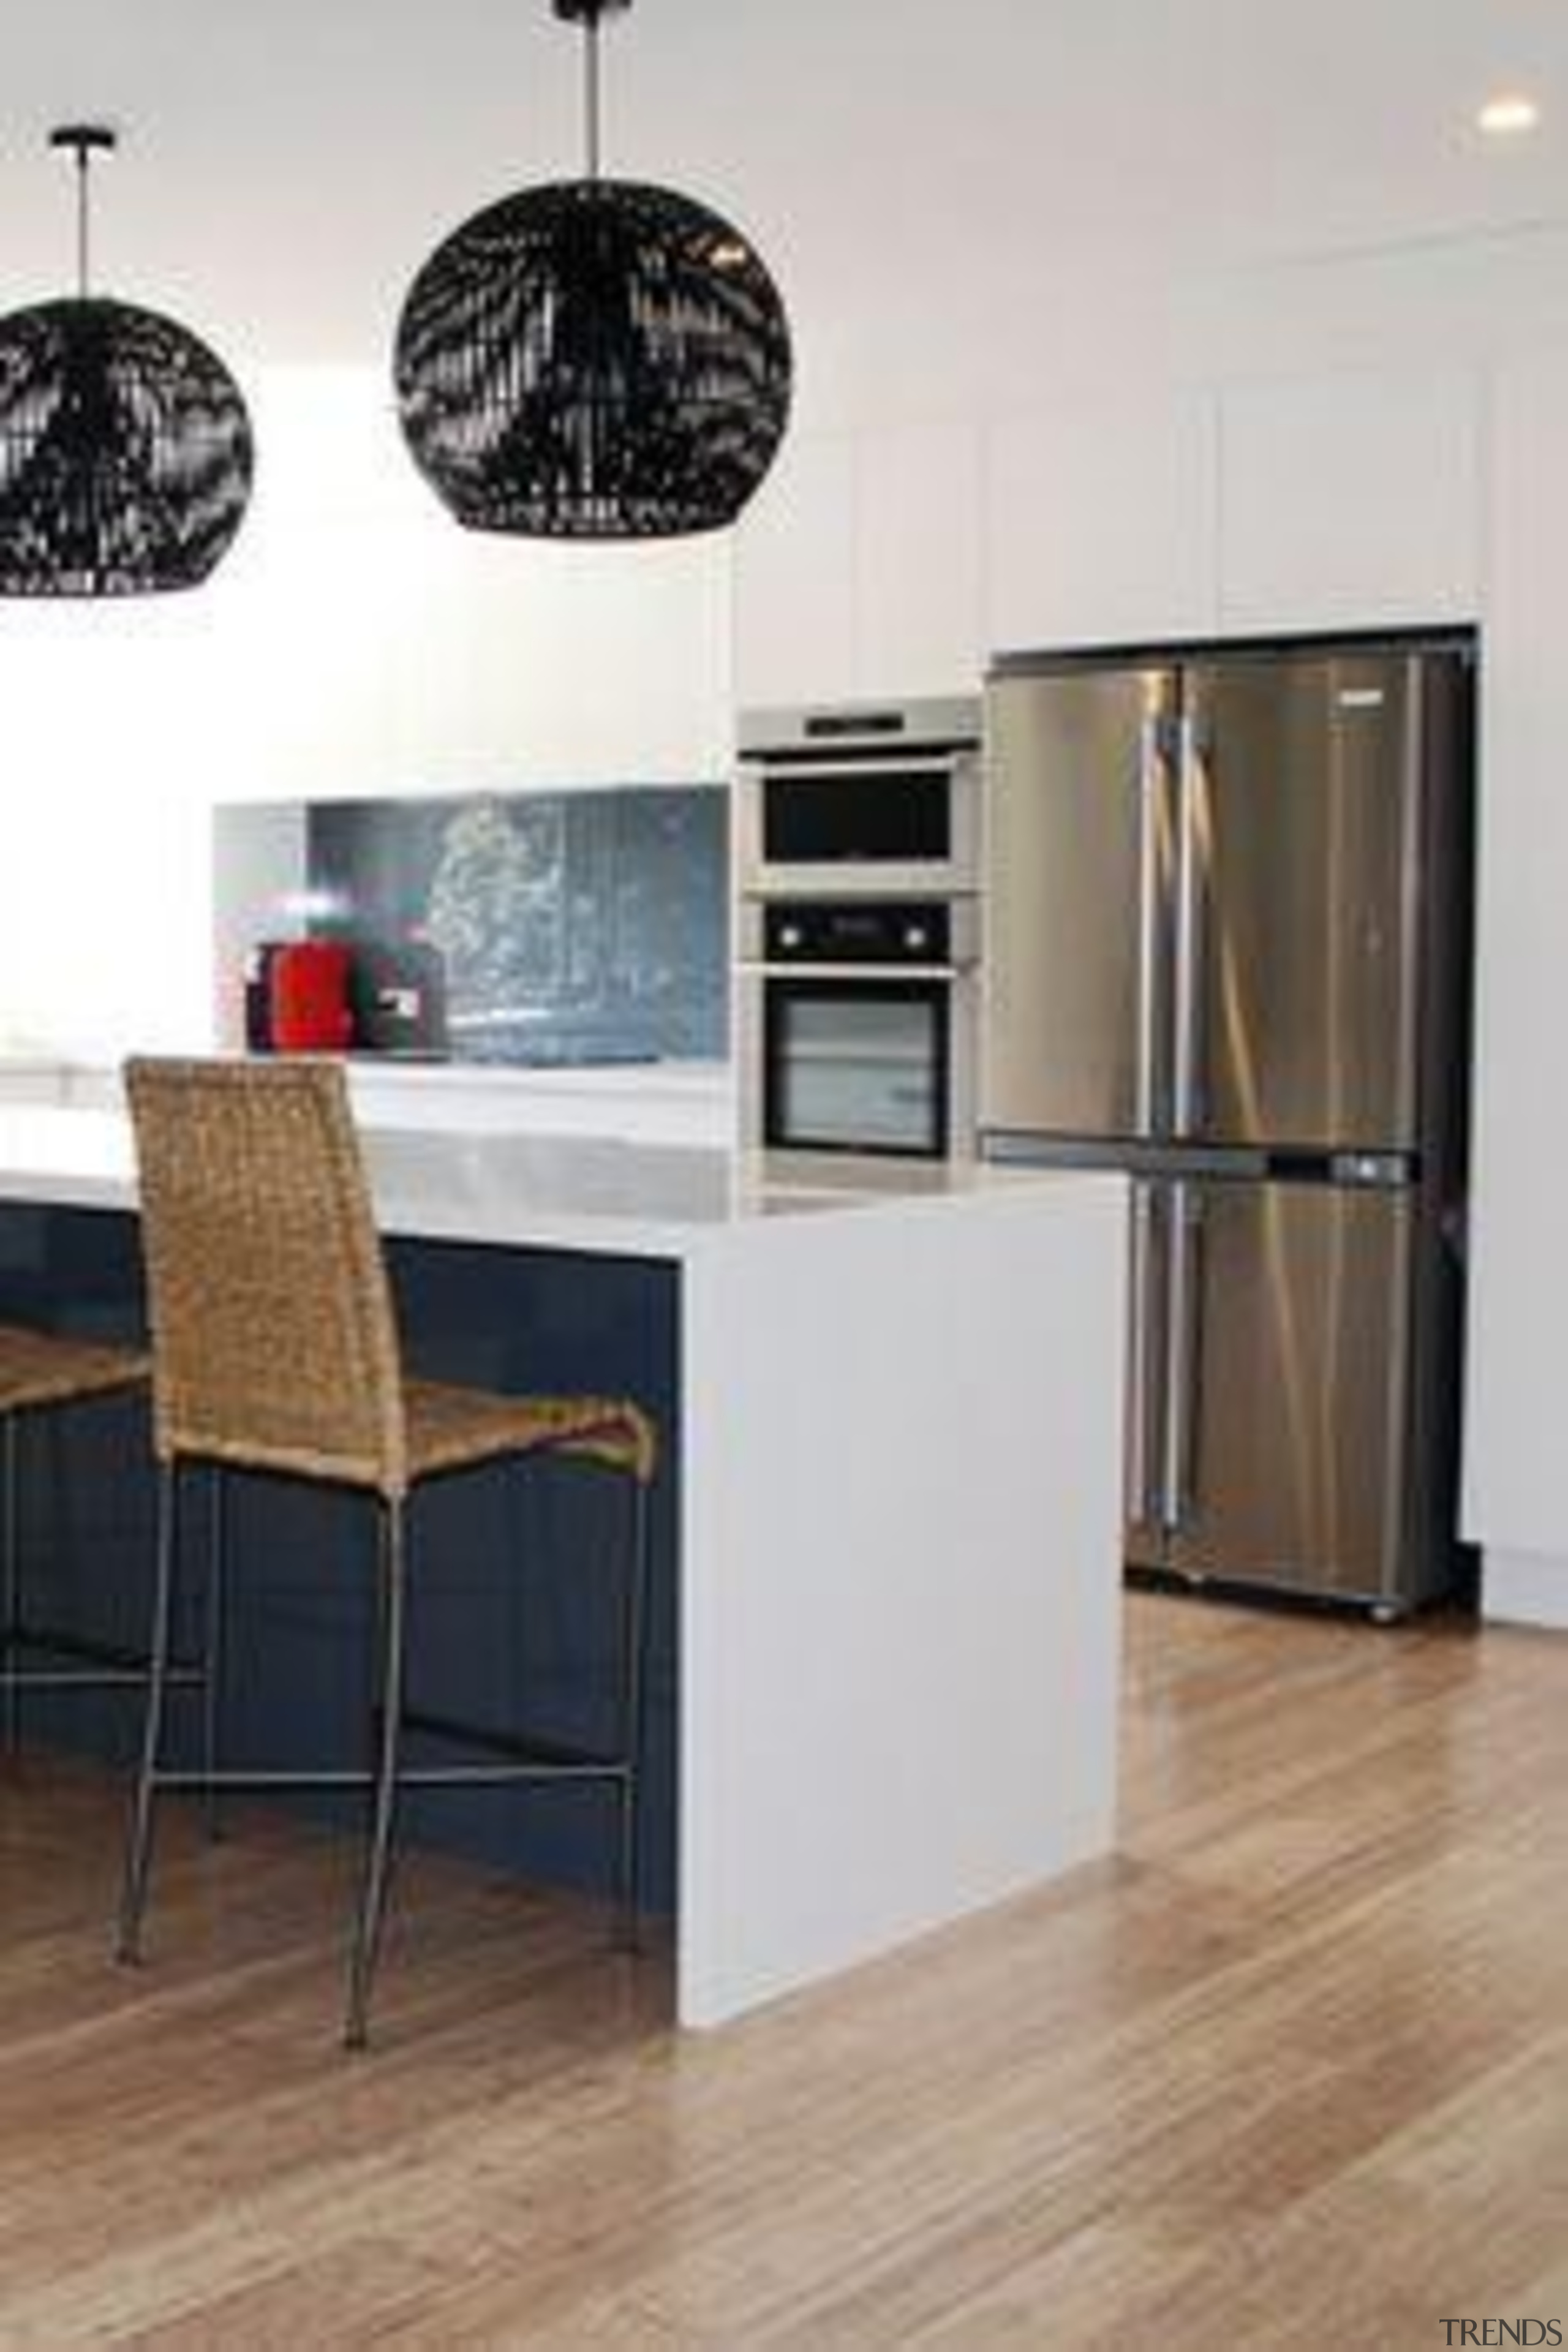 CSL Kitchens & Joinery - Organic White™ - floor, flooring, furniture, hardwood, interior design, kitchen, laminate flooring, product design, table, wall, wood flooring, white